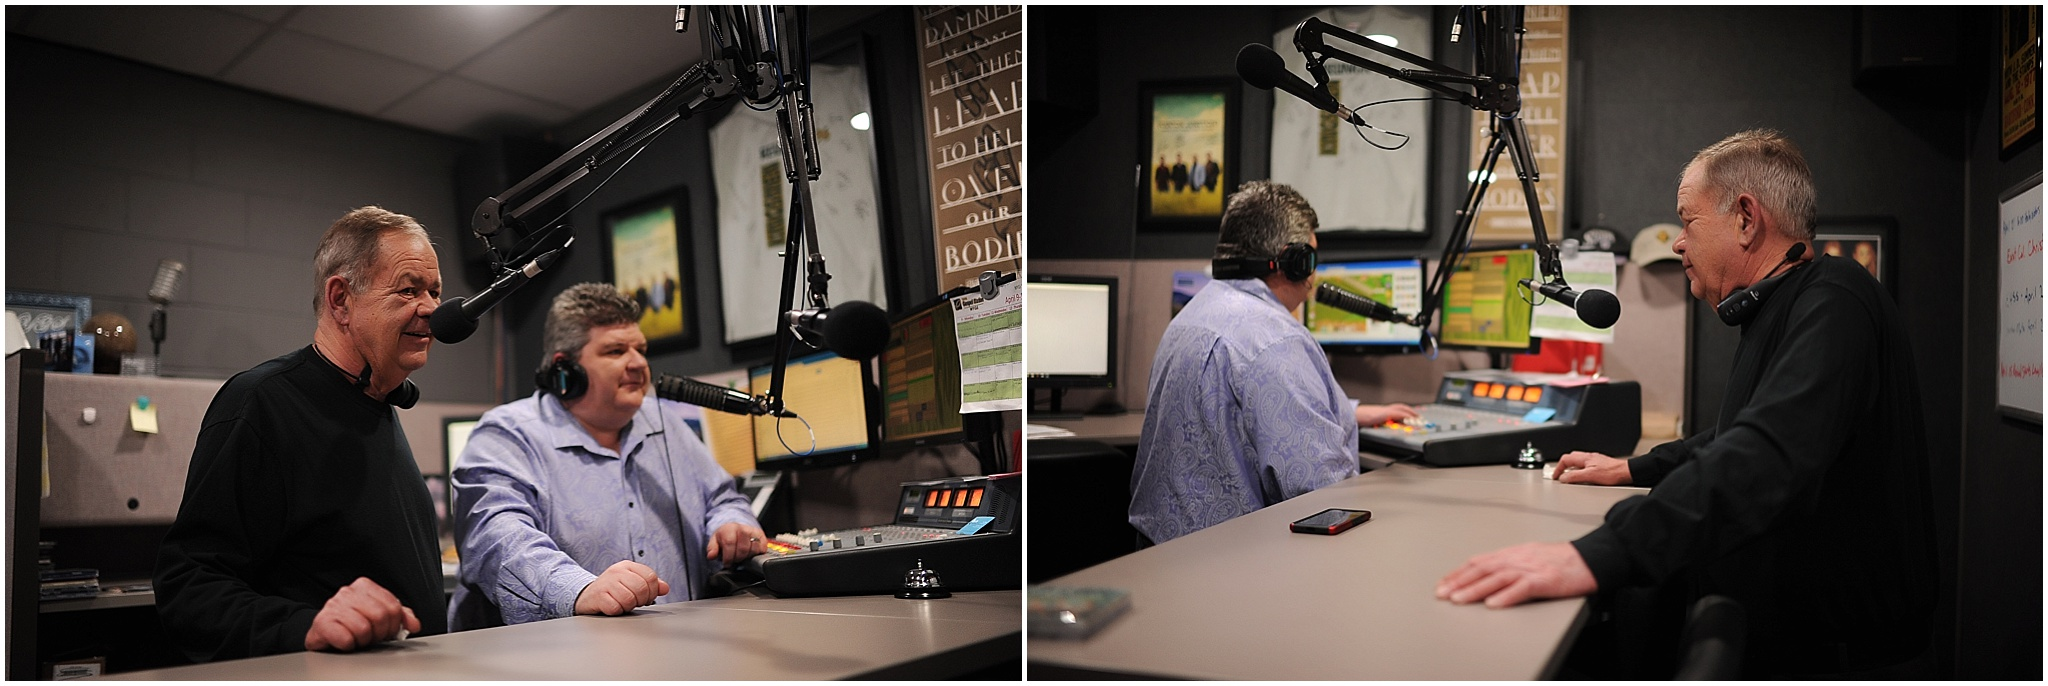 radio station in columbus, indiana - www.alielizabethphotography.com